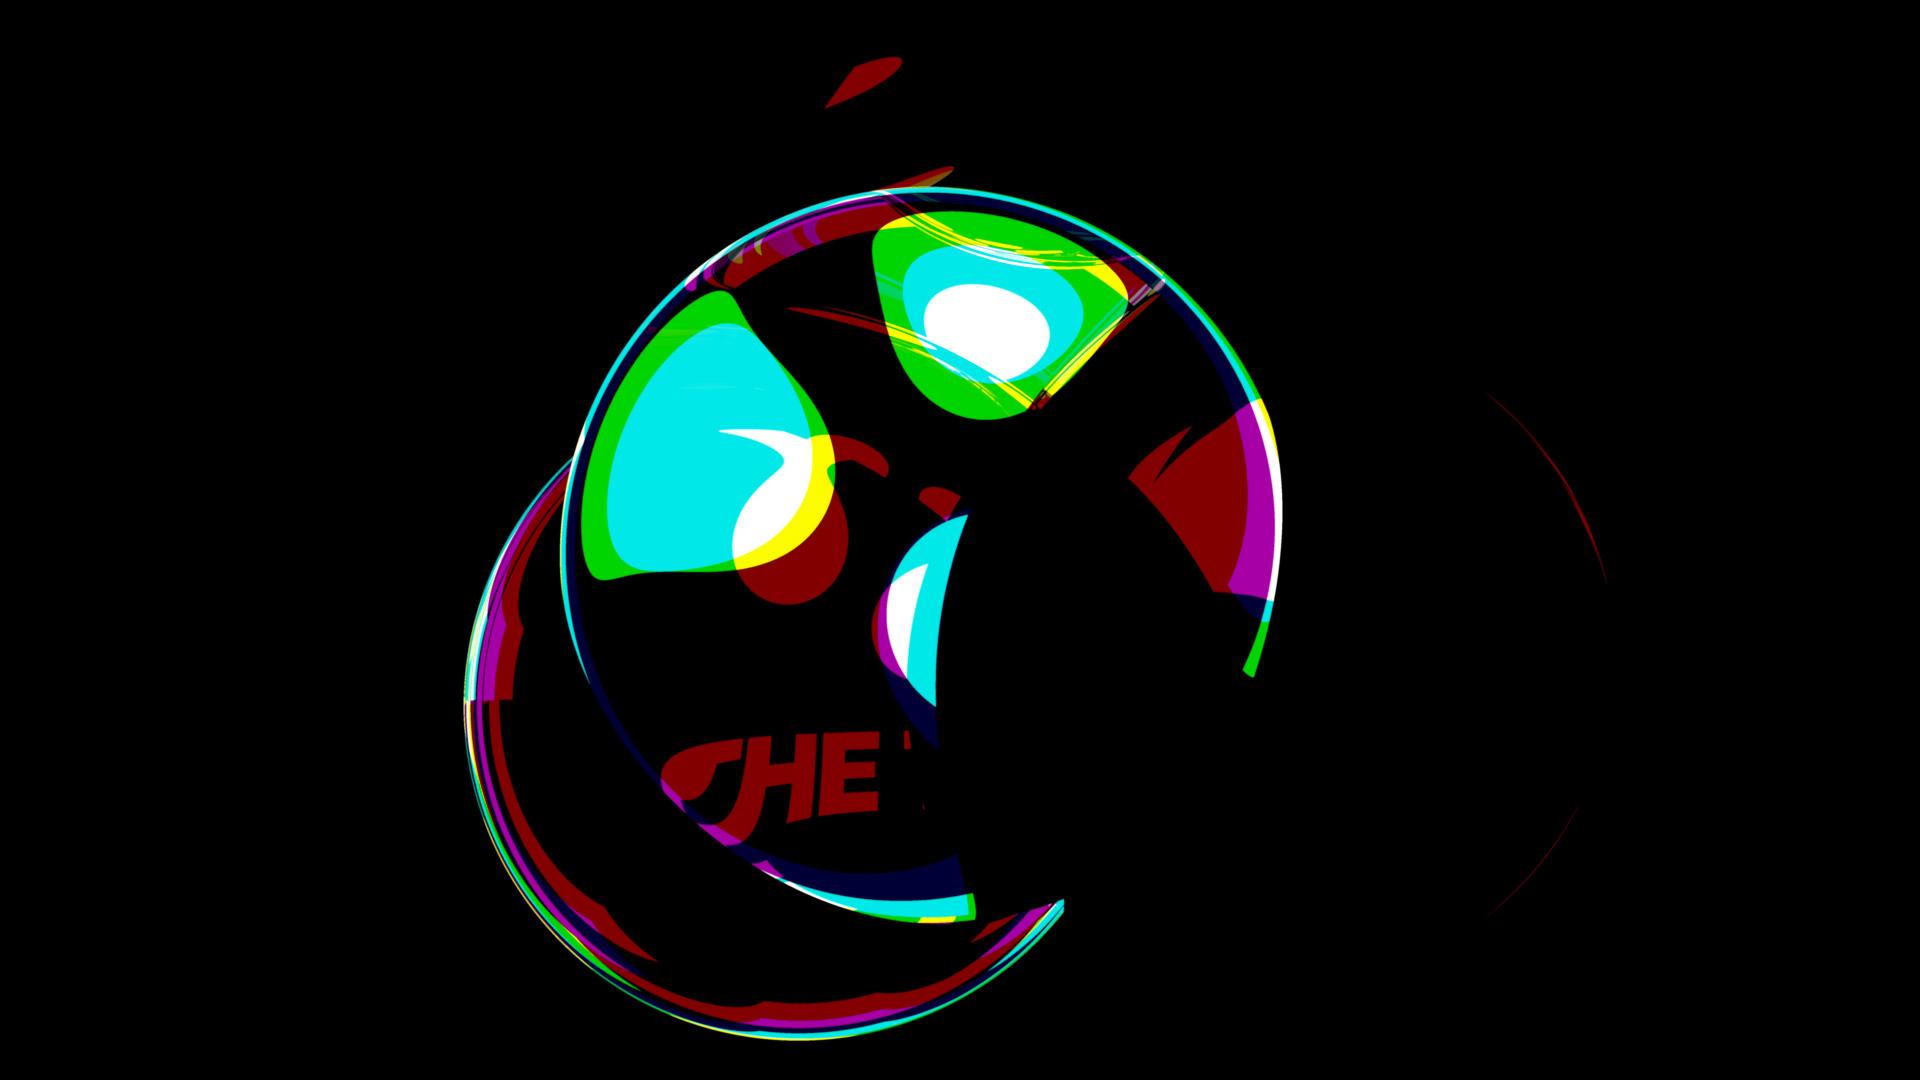 The Tube Channel Branding Refraction Video